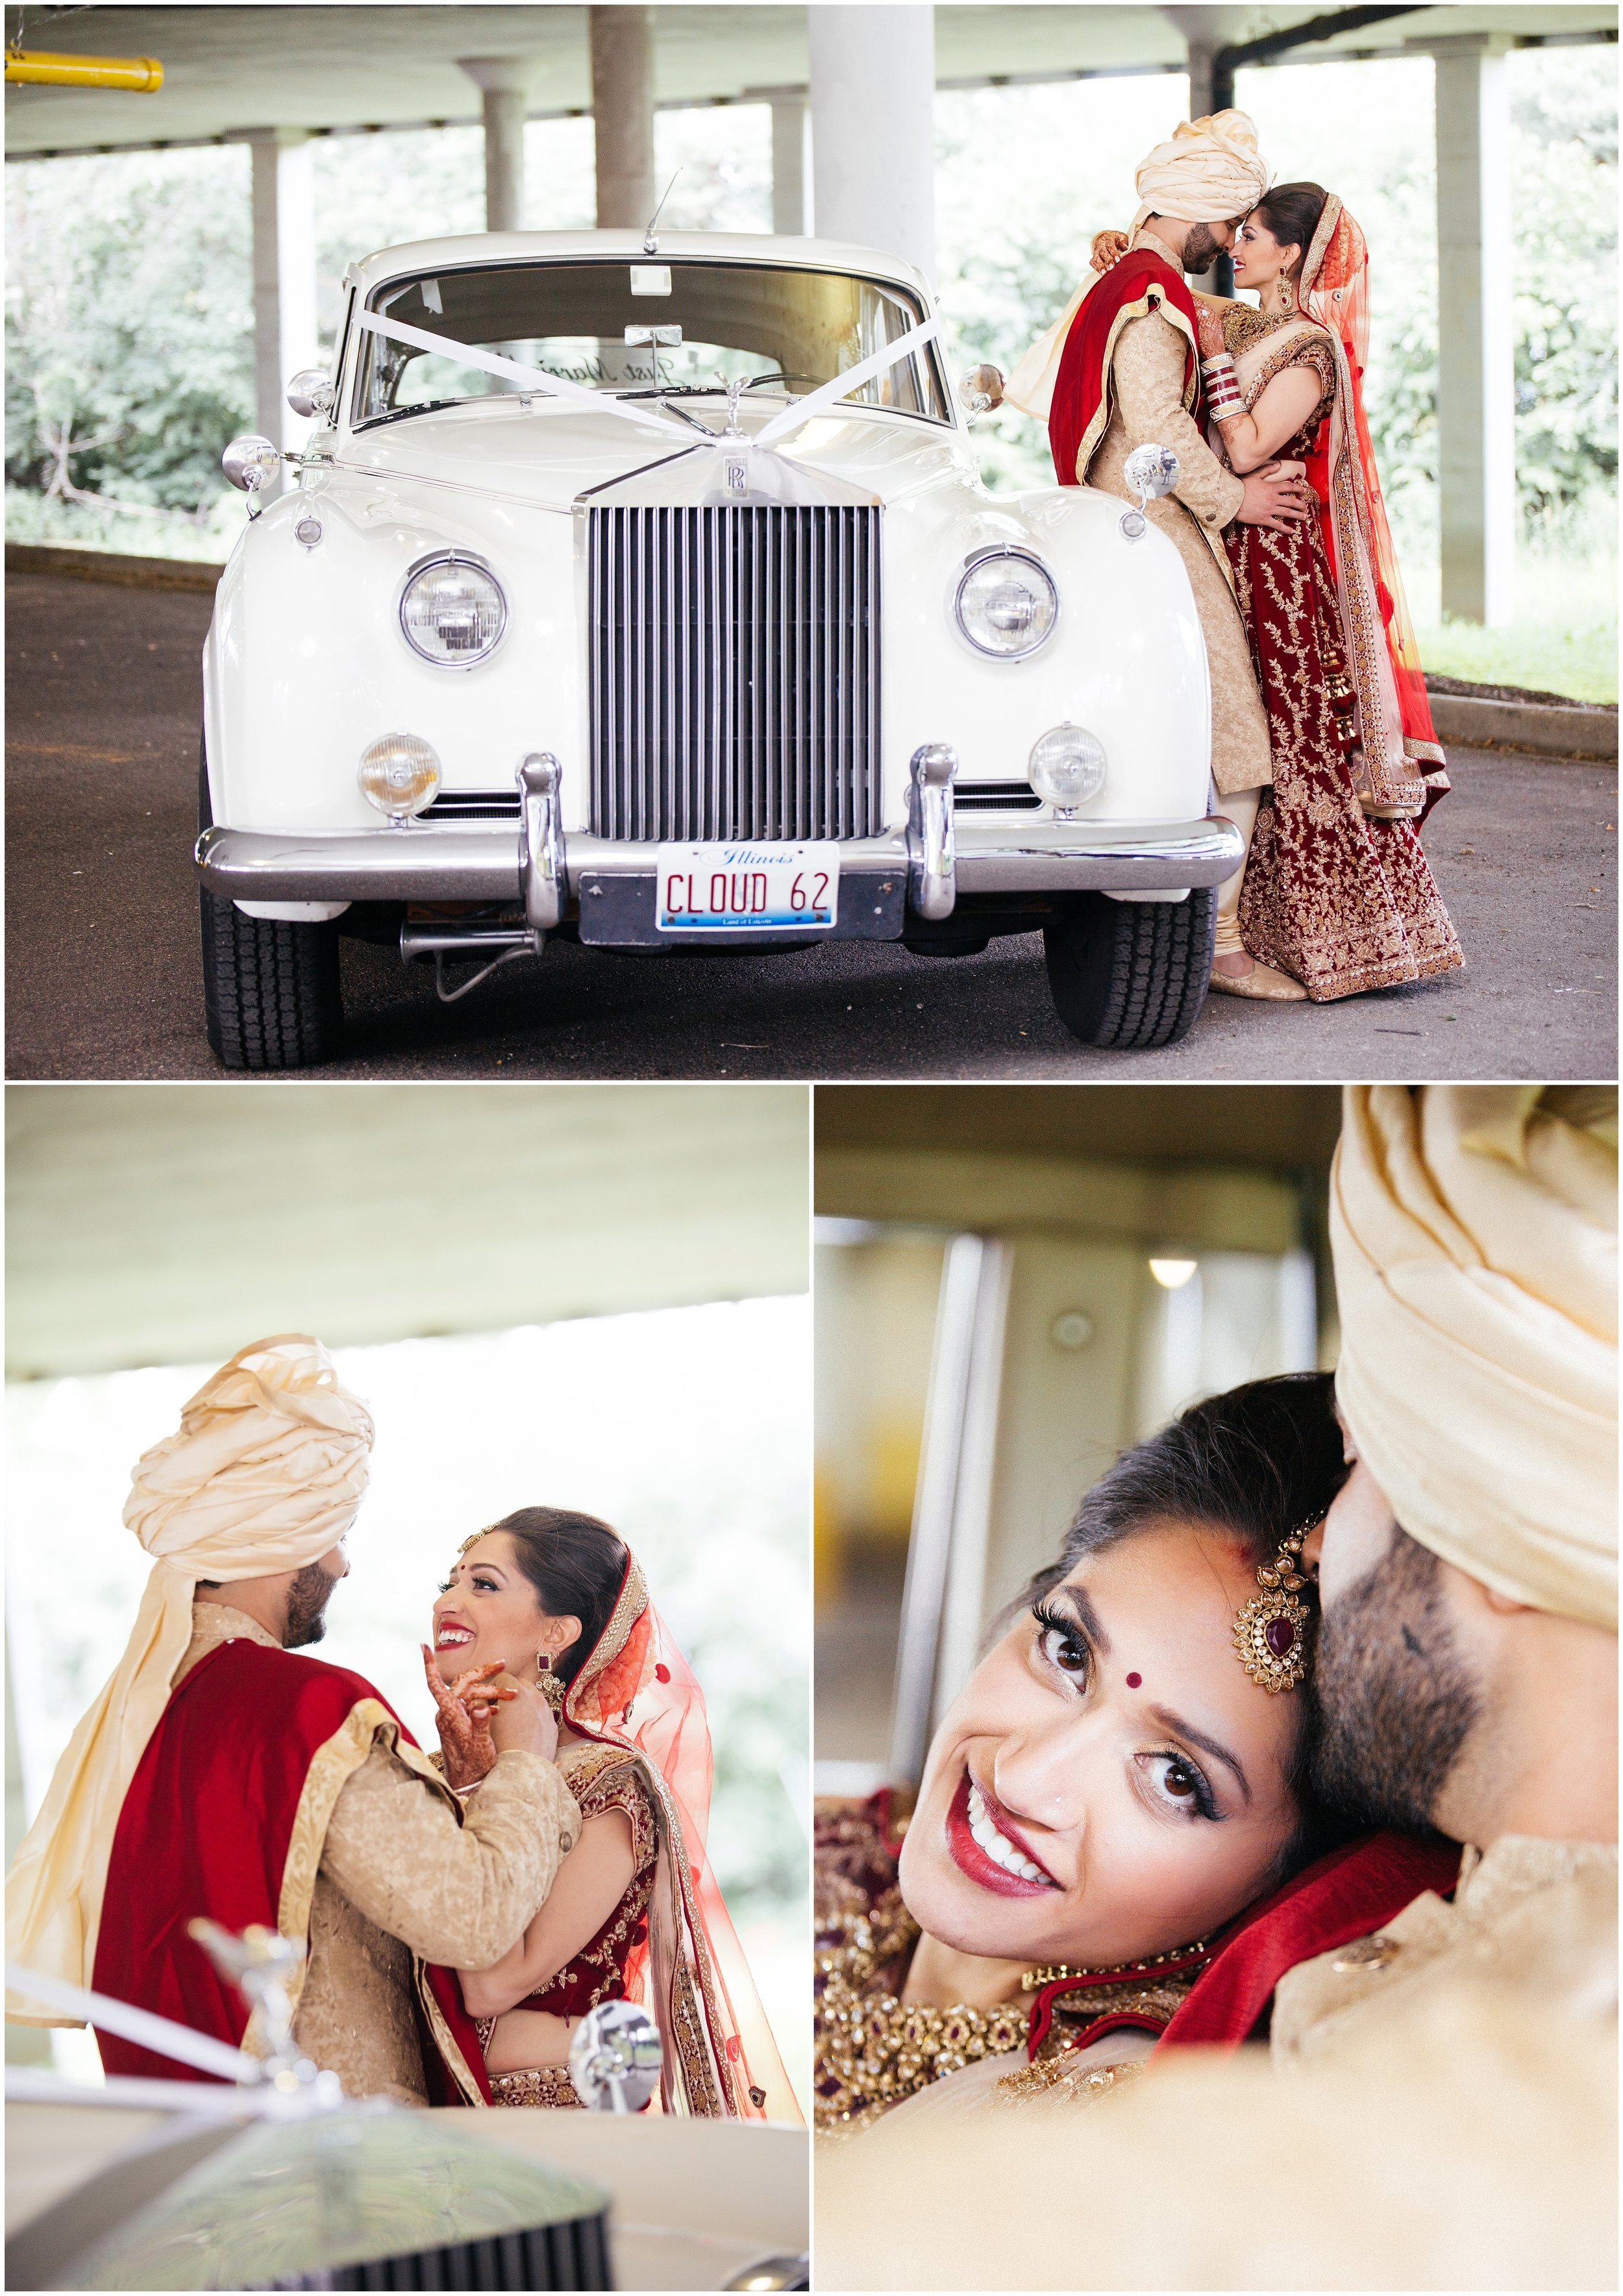 Le Cape Weddings - South Asian Wedding in Illinois - Tanvi and Anshul -0671_LuxuryDestinationPhotographer.jpg